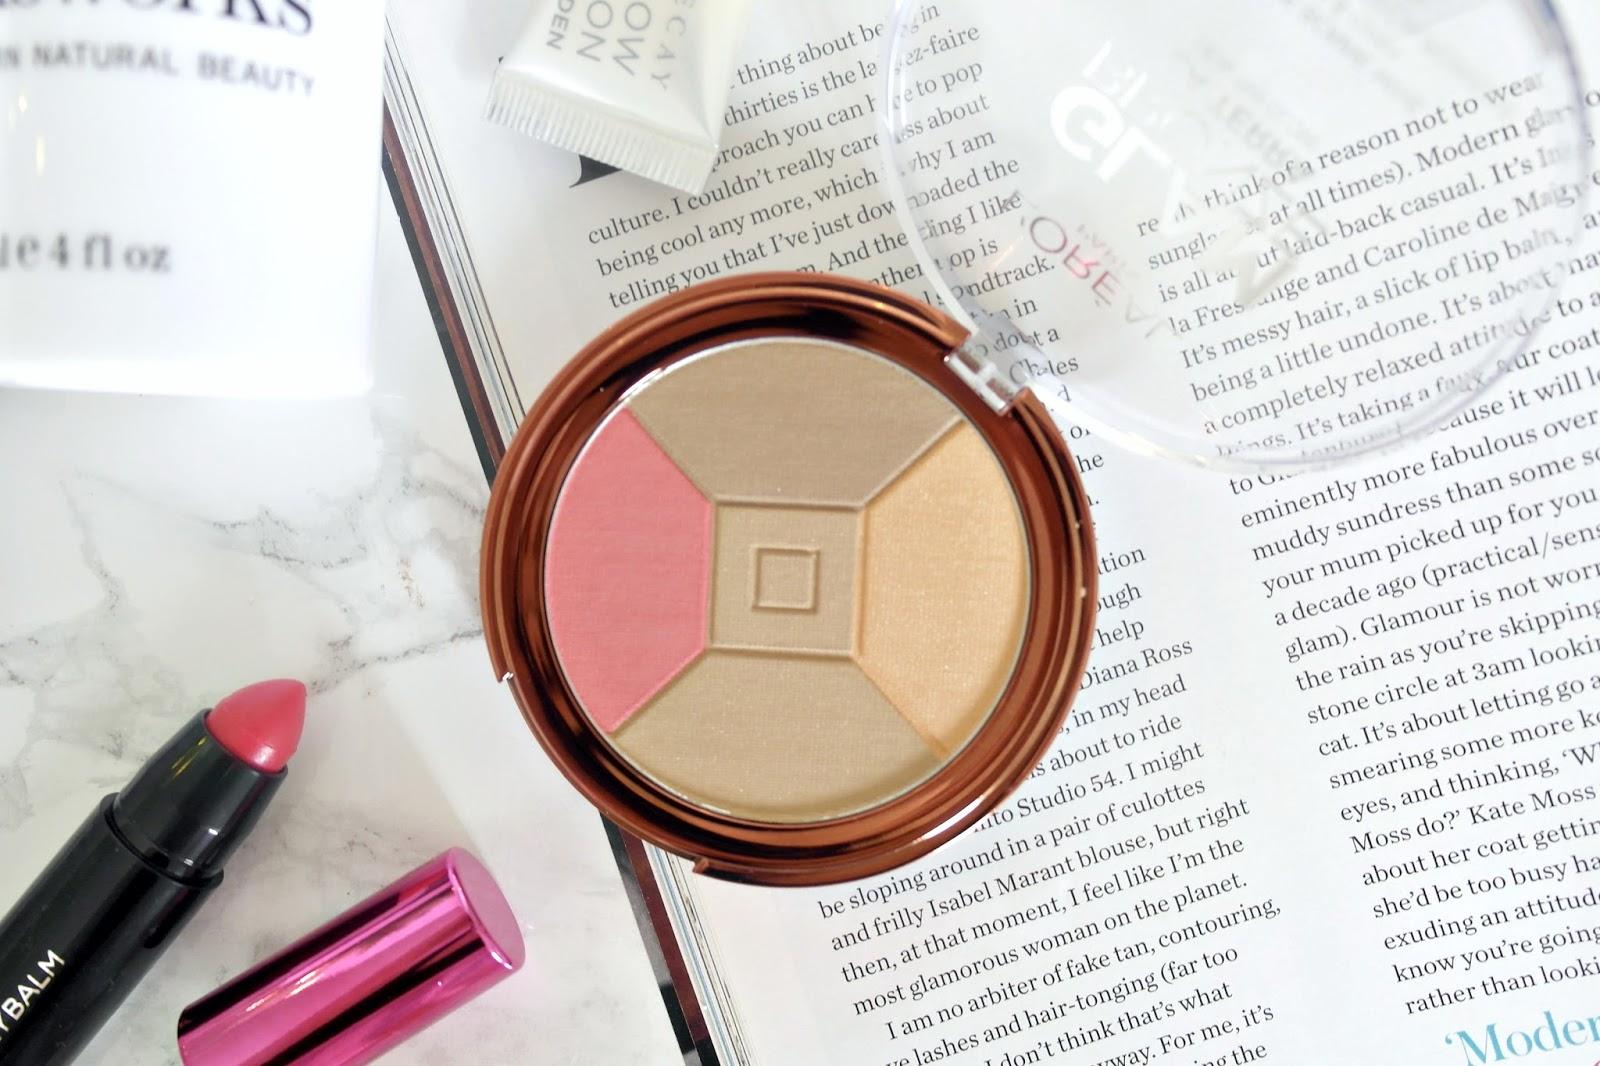 L'OREAL Glam Bronze La Terra Healthy Glow review